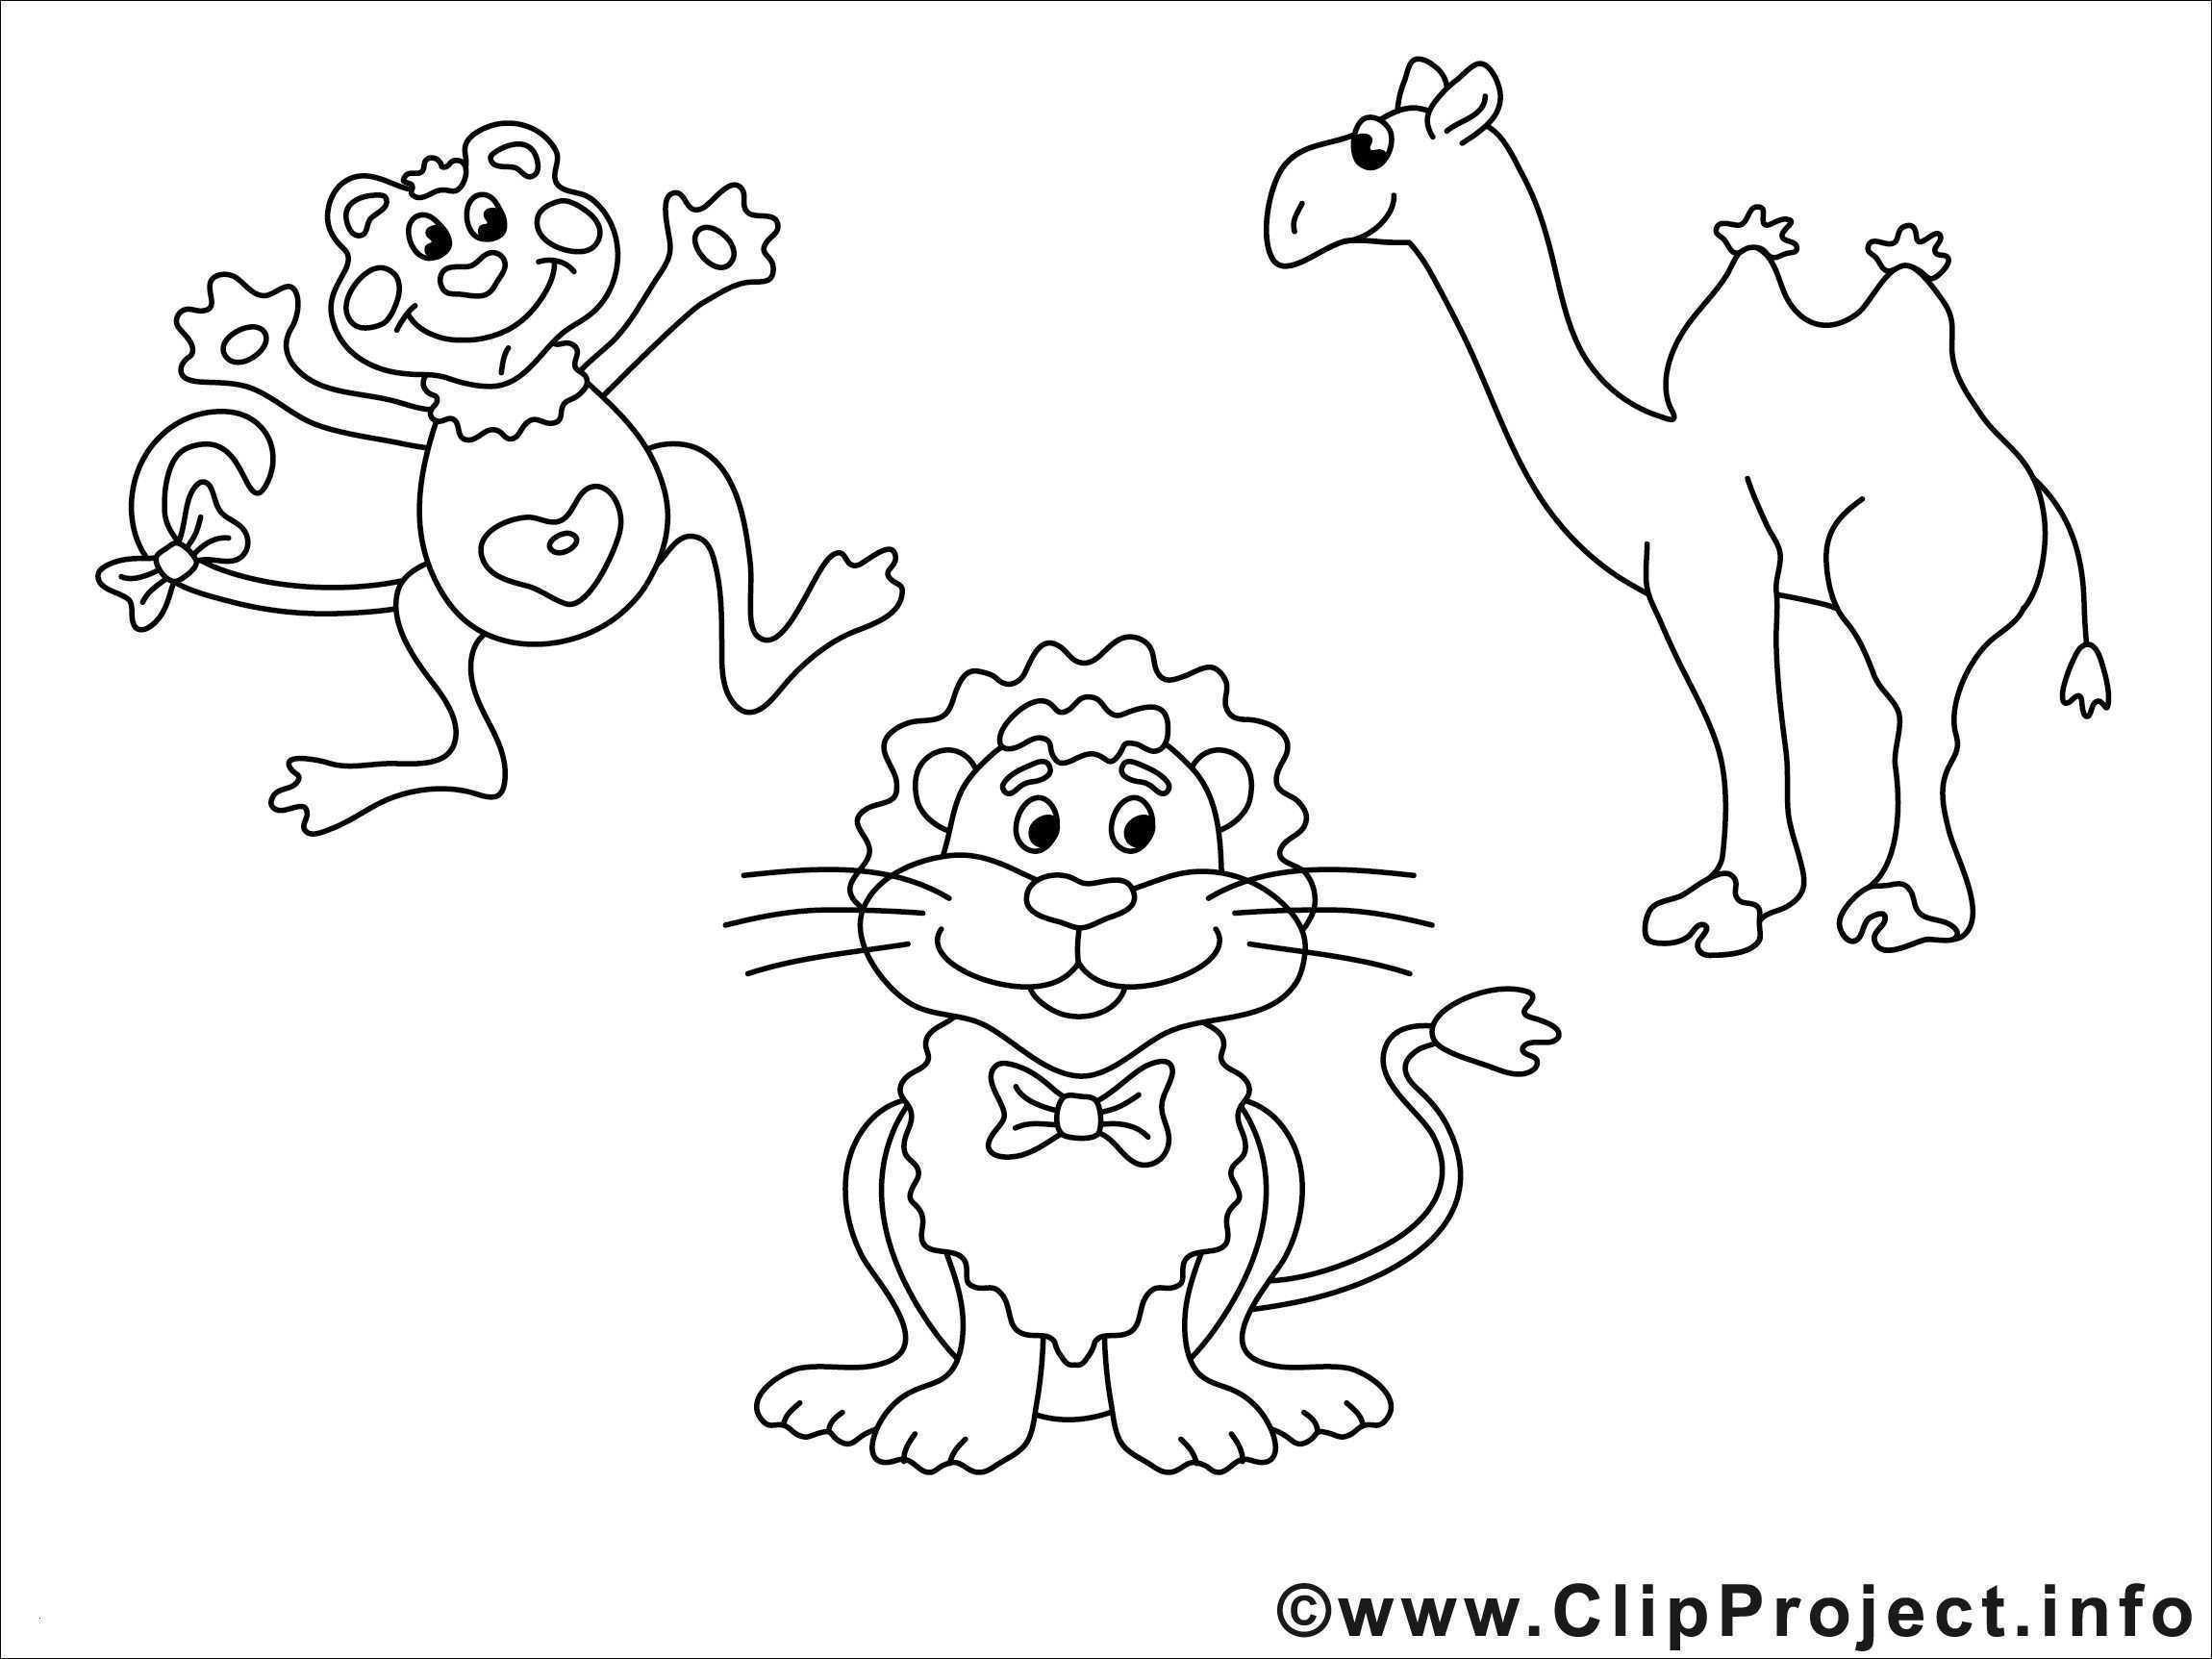 Pippi Langstrumpf Ausmalbilder Einzigartig Pippi Langstrumpf Ausmalbilder Malvorlagen Bild Pippi Langstrumpf Sammlung